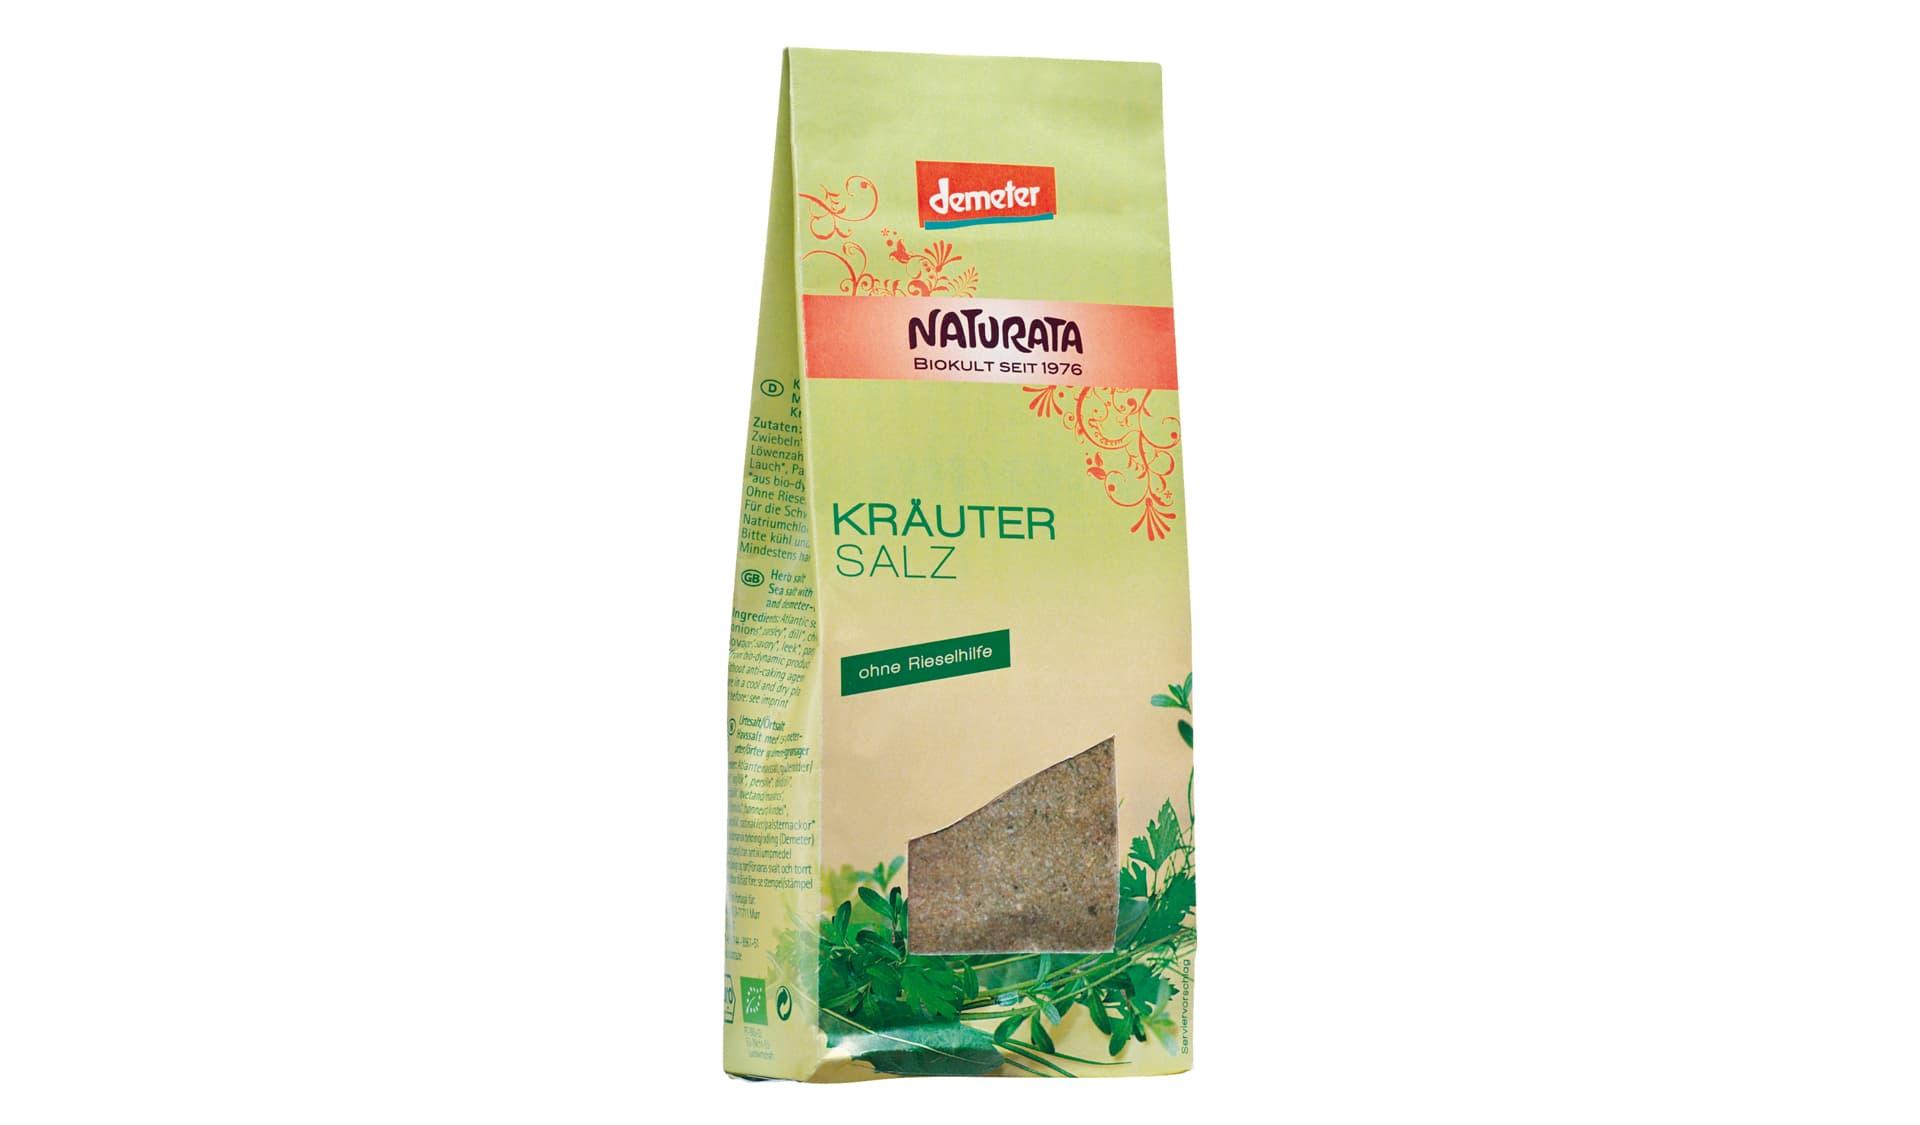 Naturata Kräutersalz ohne Rieselhilfe (www.naturata.de)